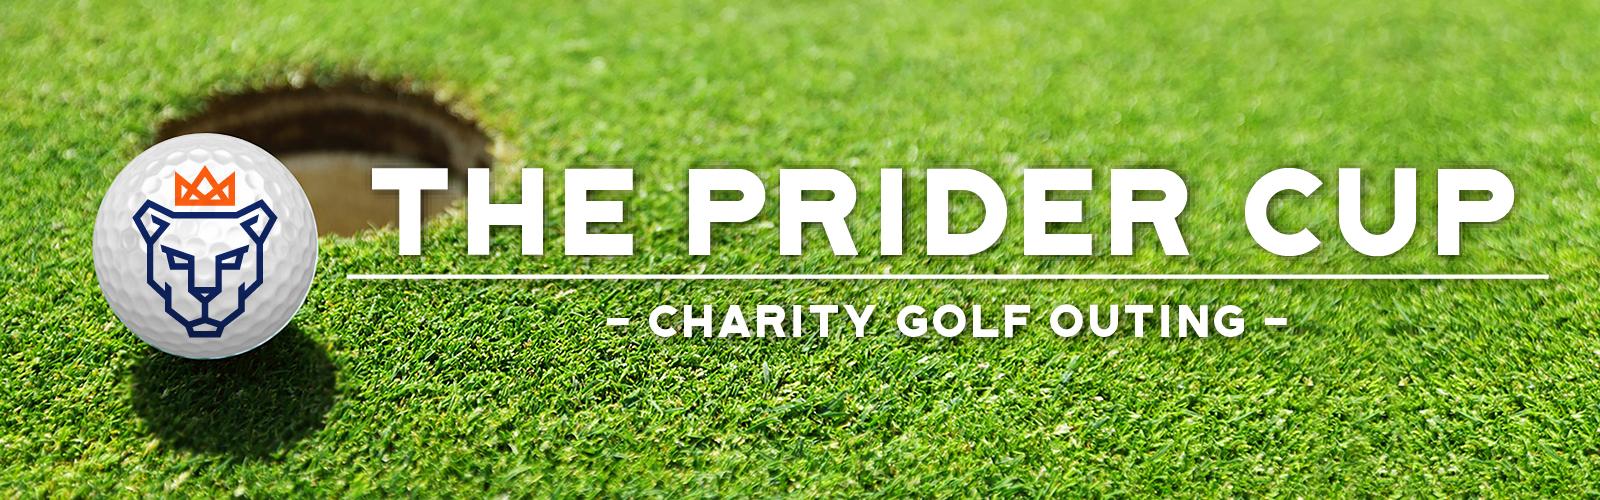 Prider Cup Banner.jpg